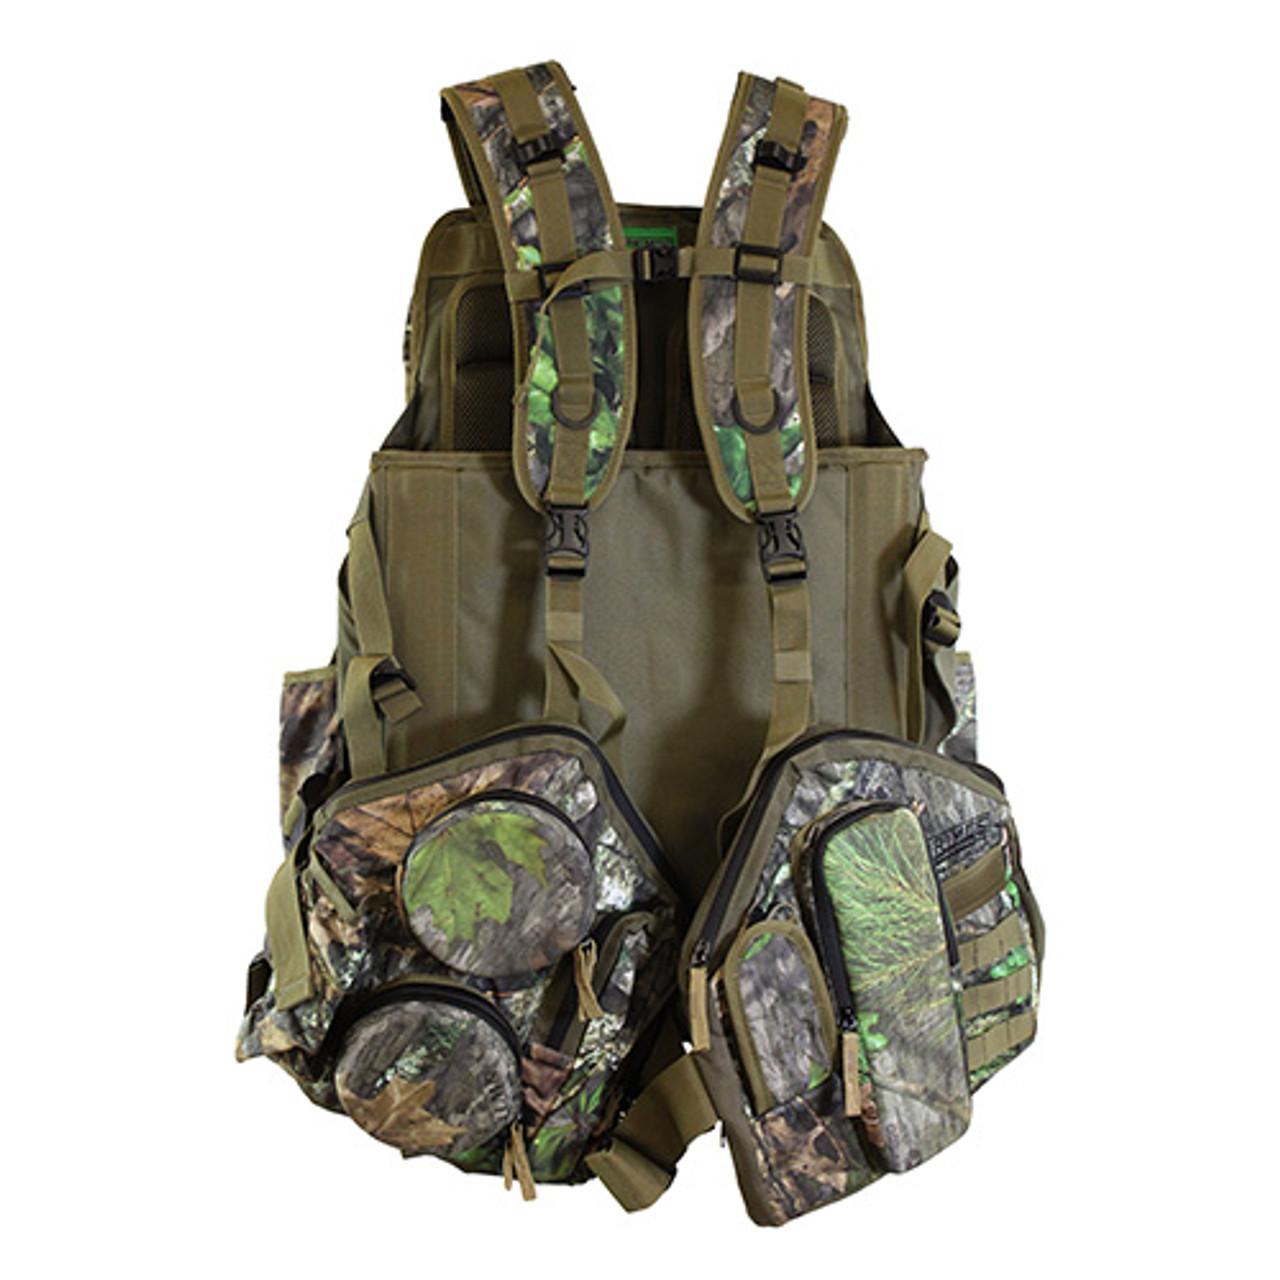 f8200712e918c Primos 65715 Rocker Hunting Vest Medium/X-Large Realtree Xtra Obsession  10135651756